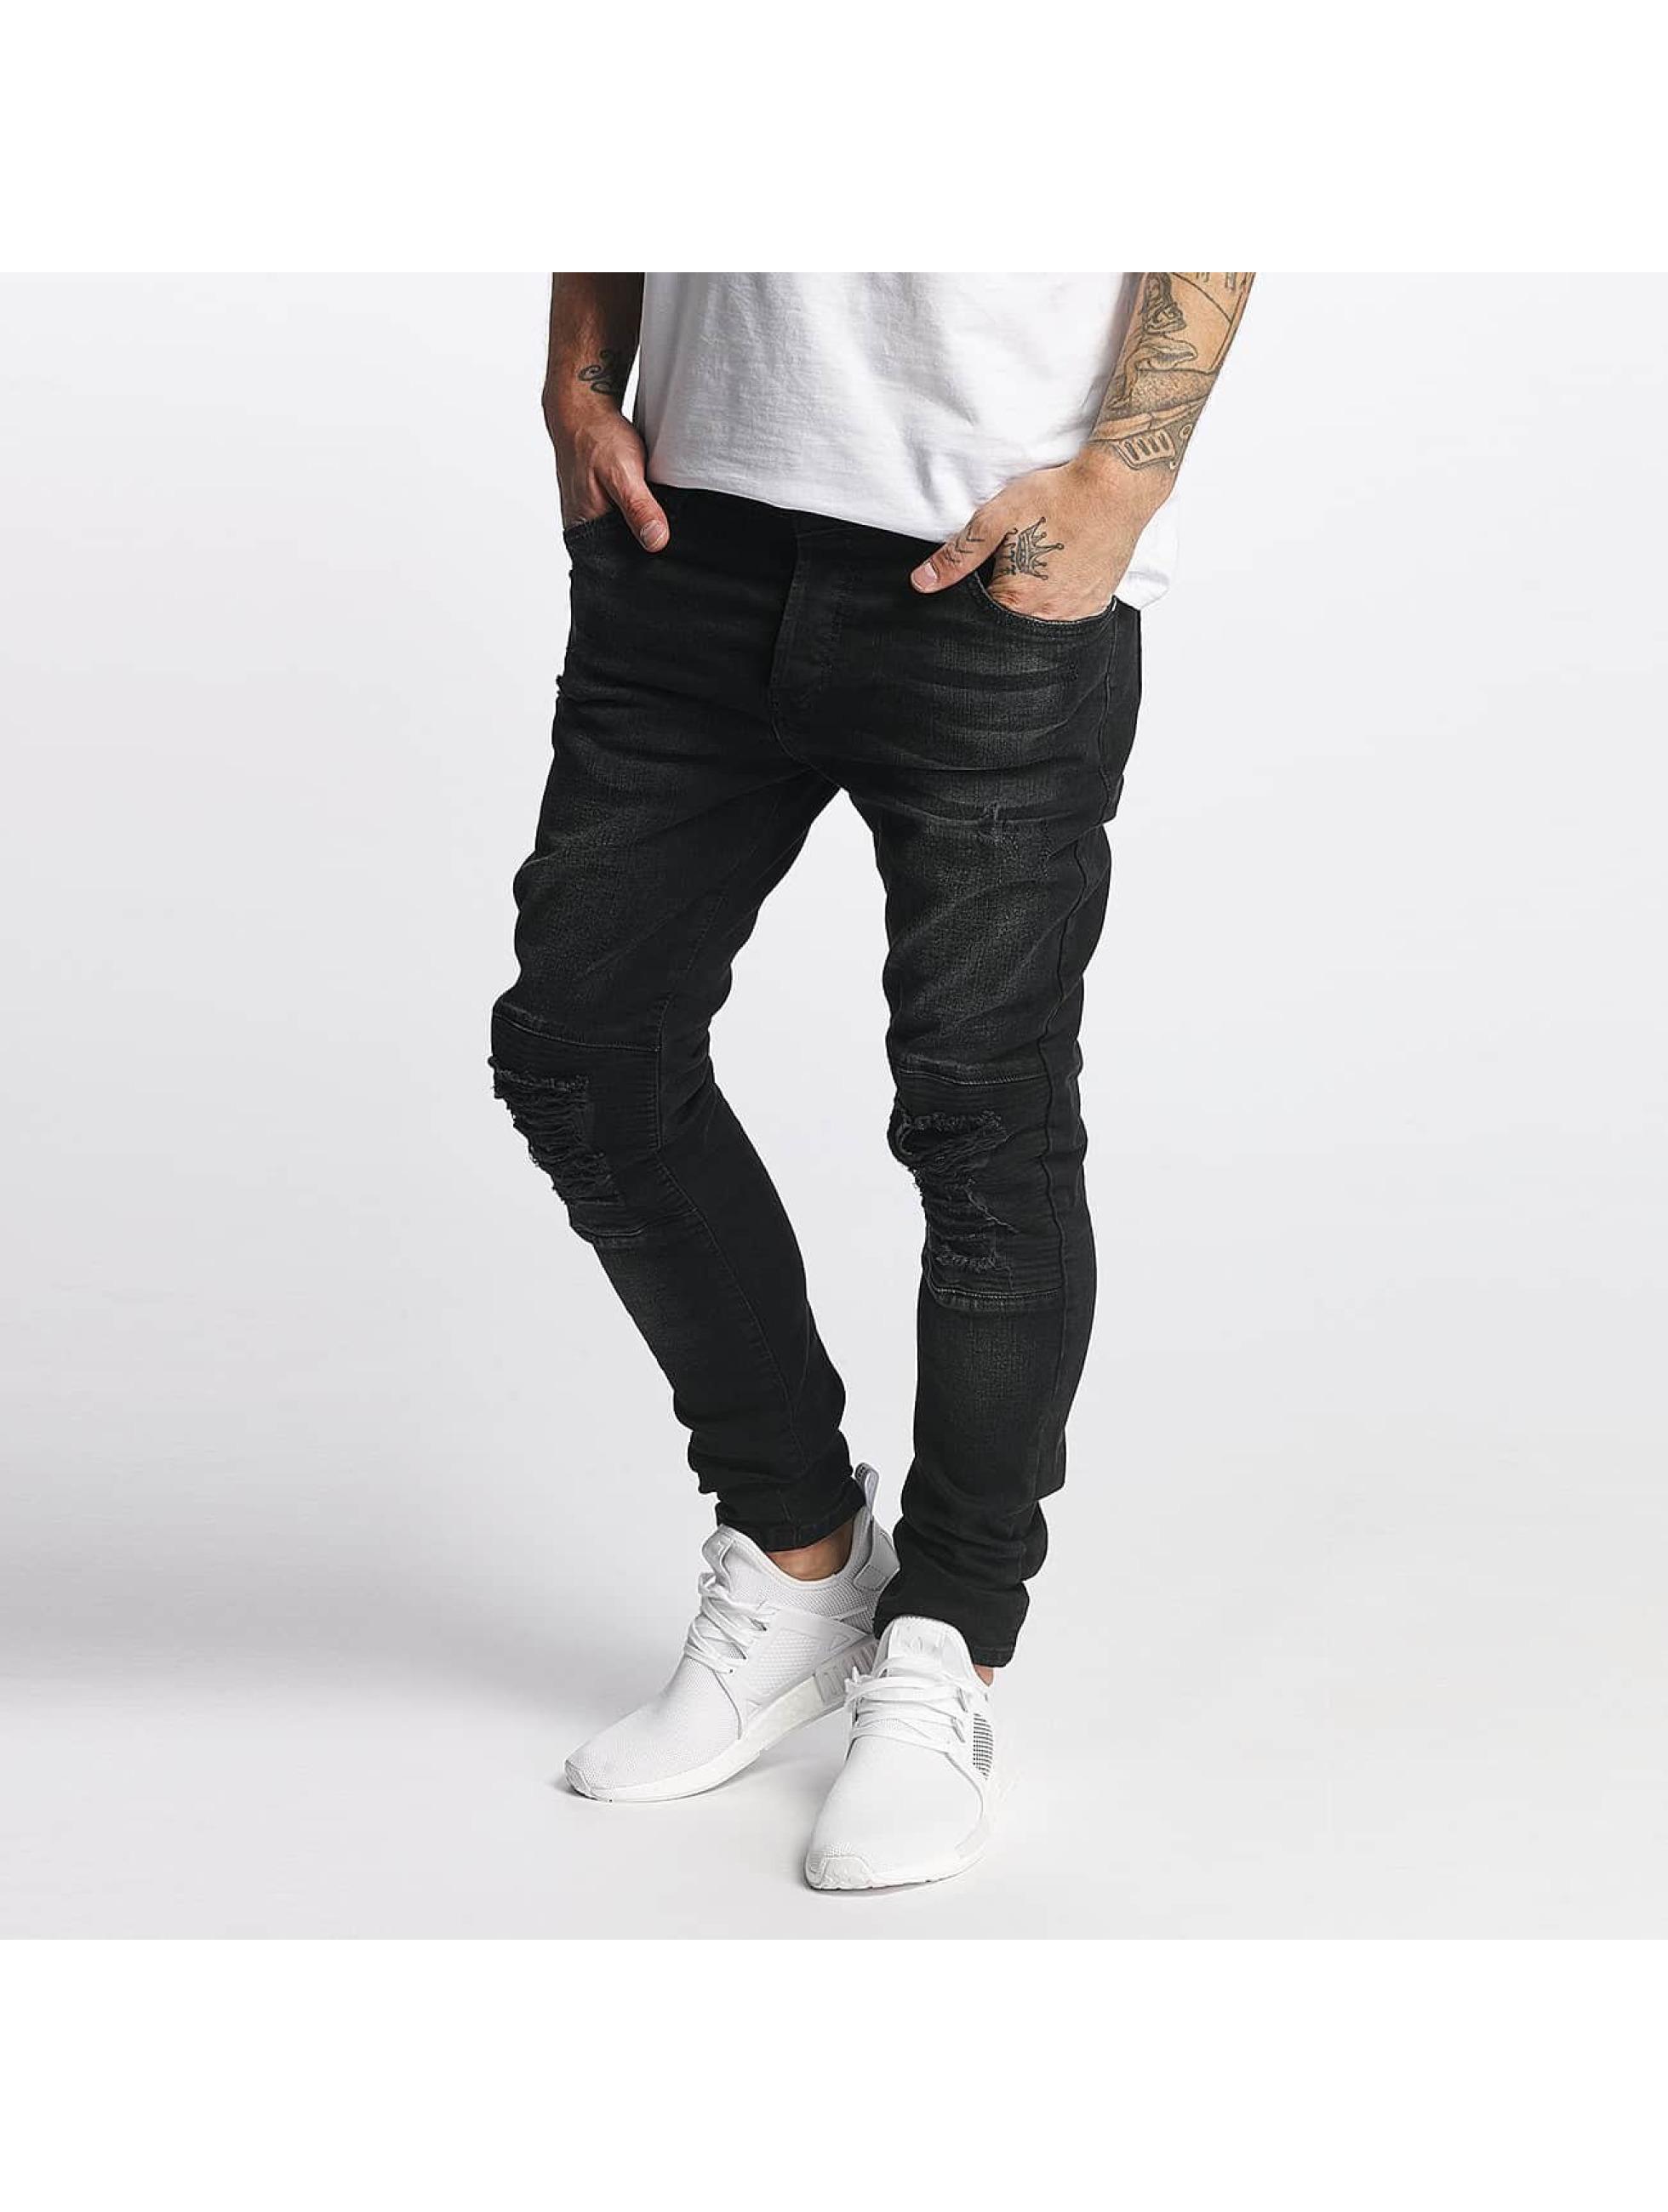 VSCT Clubwear Männer Slim Fit Jeans Knox Kneecut Leahter Kneepatch in schwarz